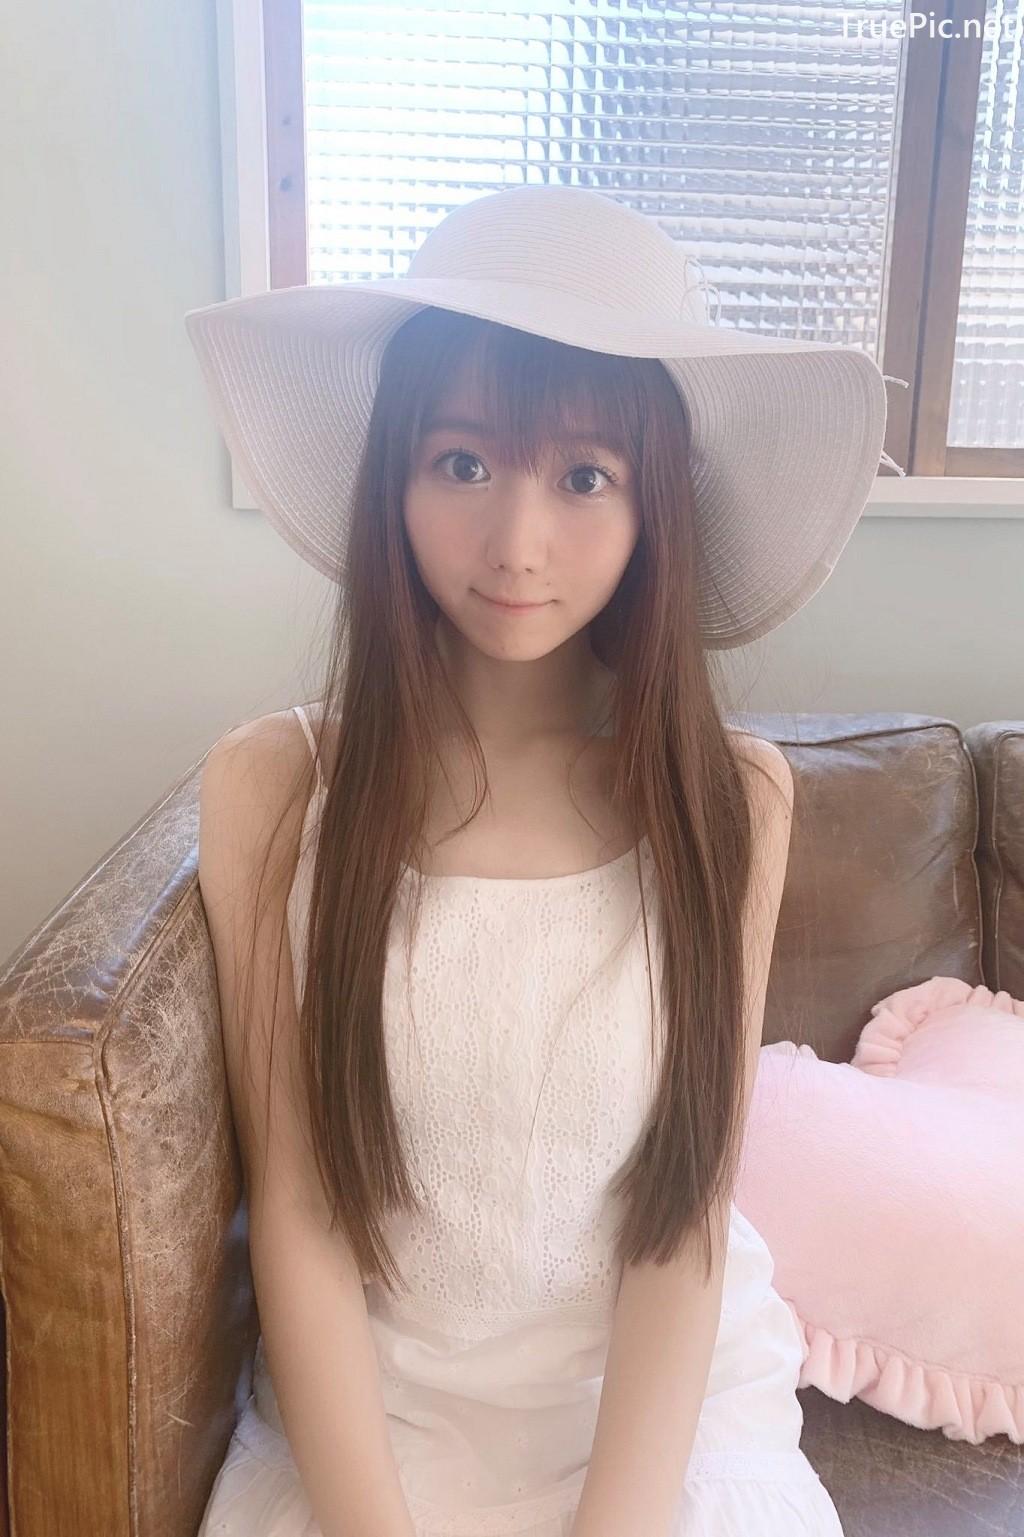 Image Japanese Singer And Idol - Otani Emiri - [Young Animal] 2019 No.13 - TruePic.net - Picture-4